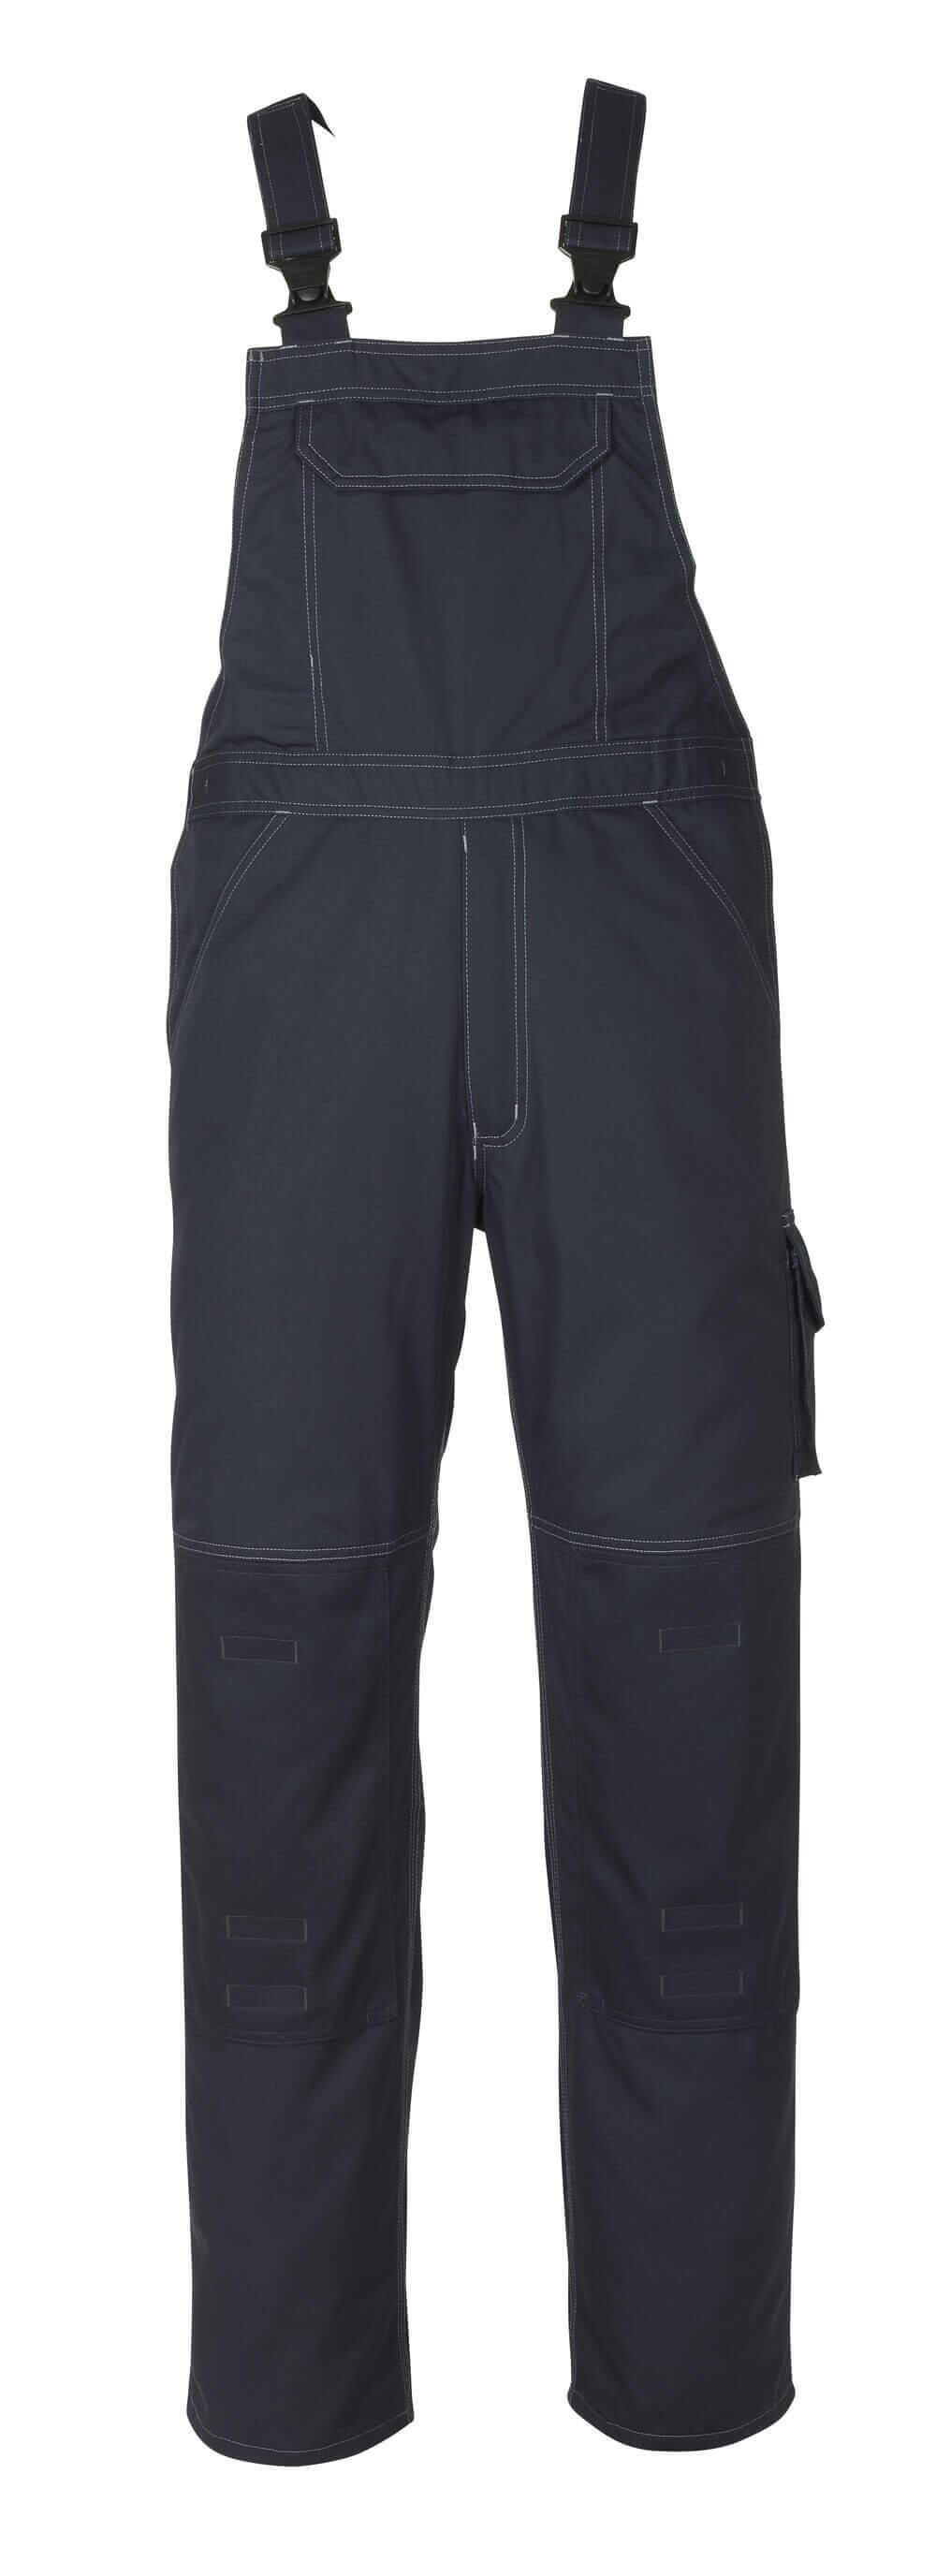 10569-442-010 Bib & Brace with kneepad pockets - dark navy